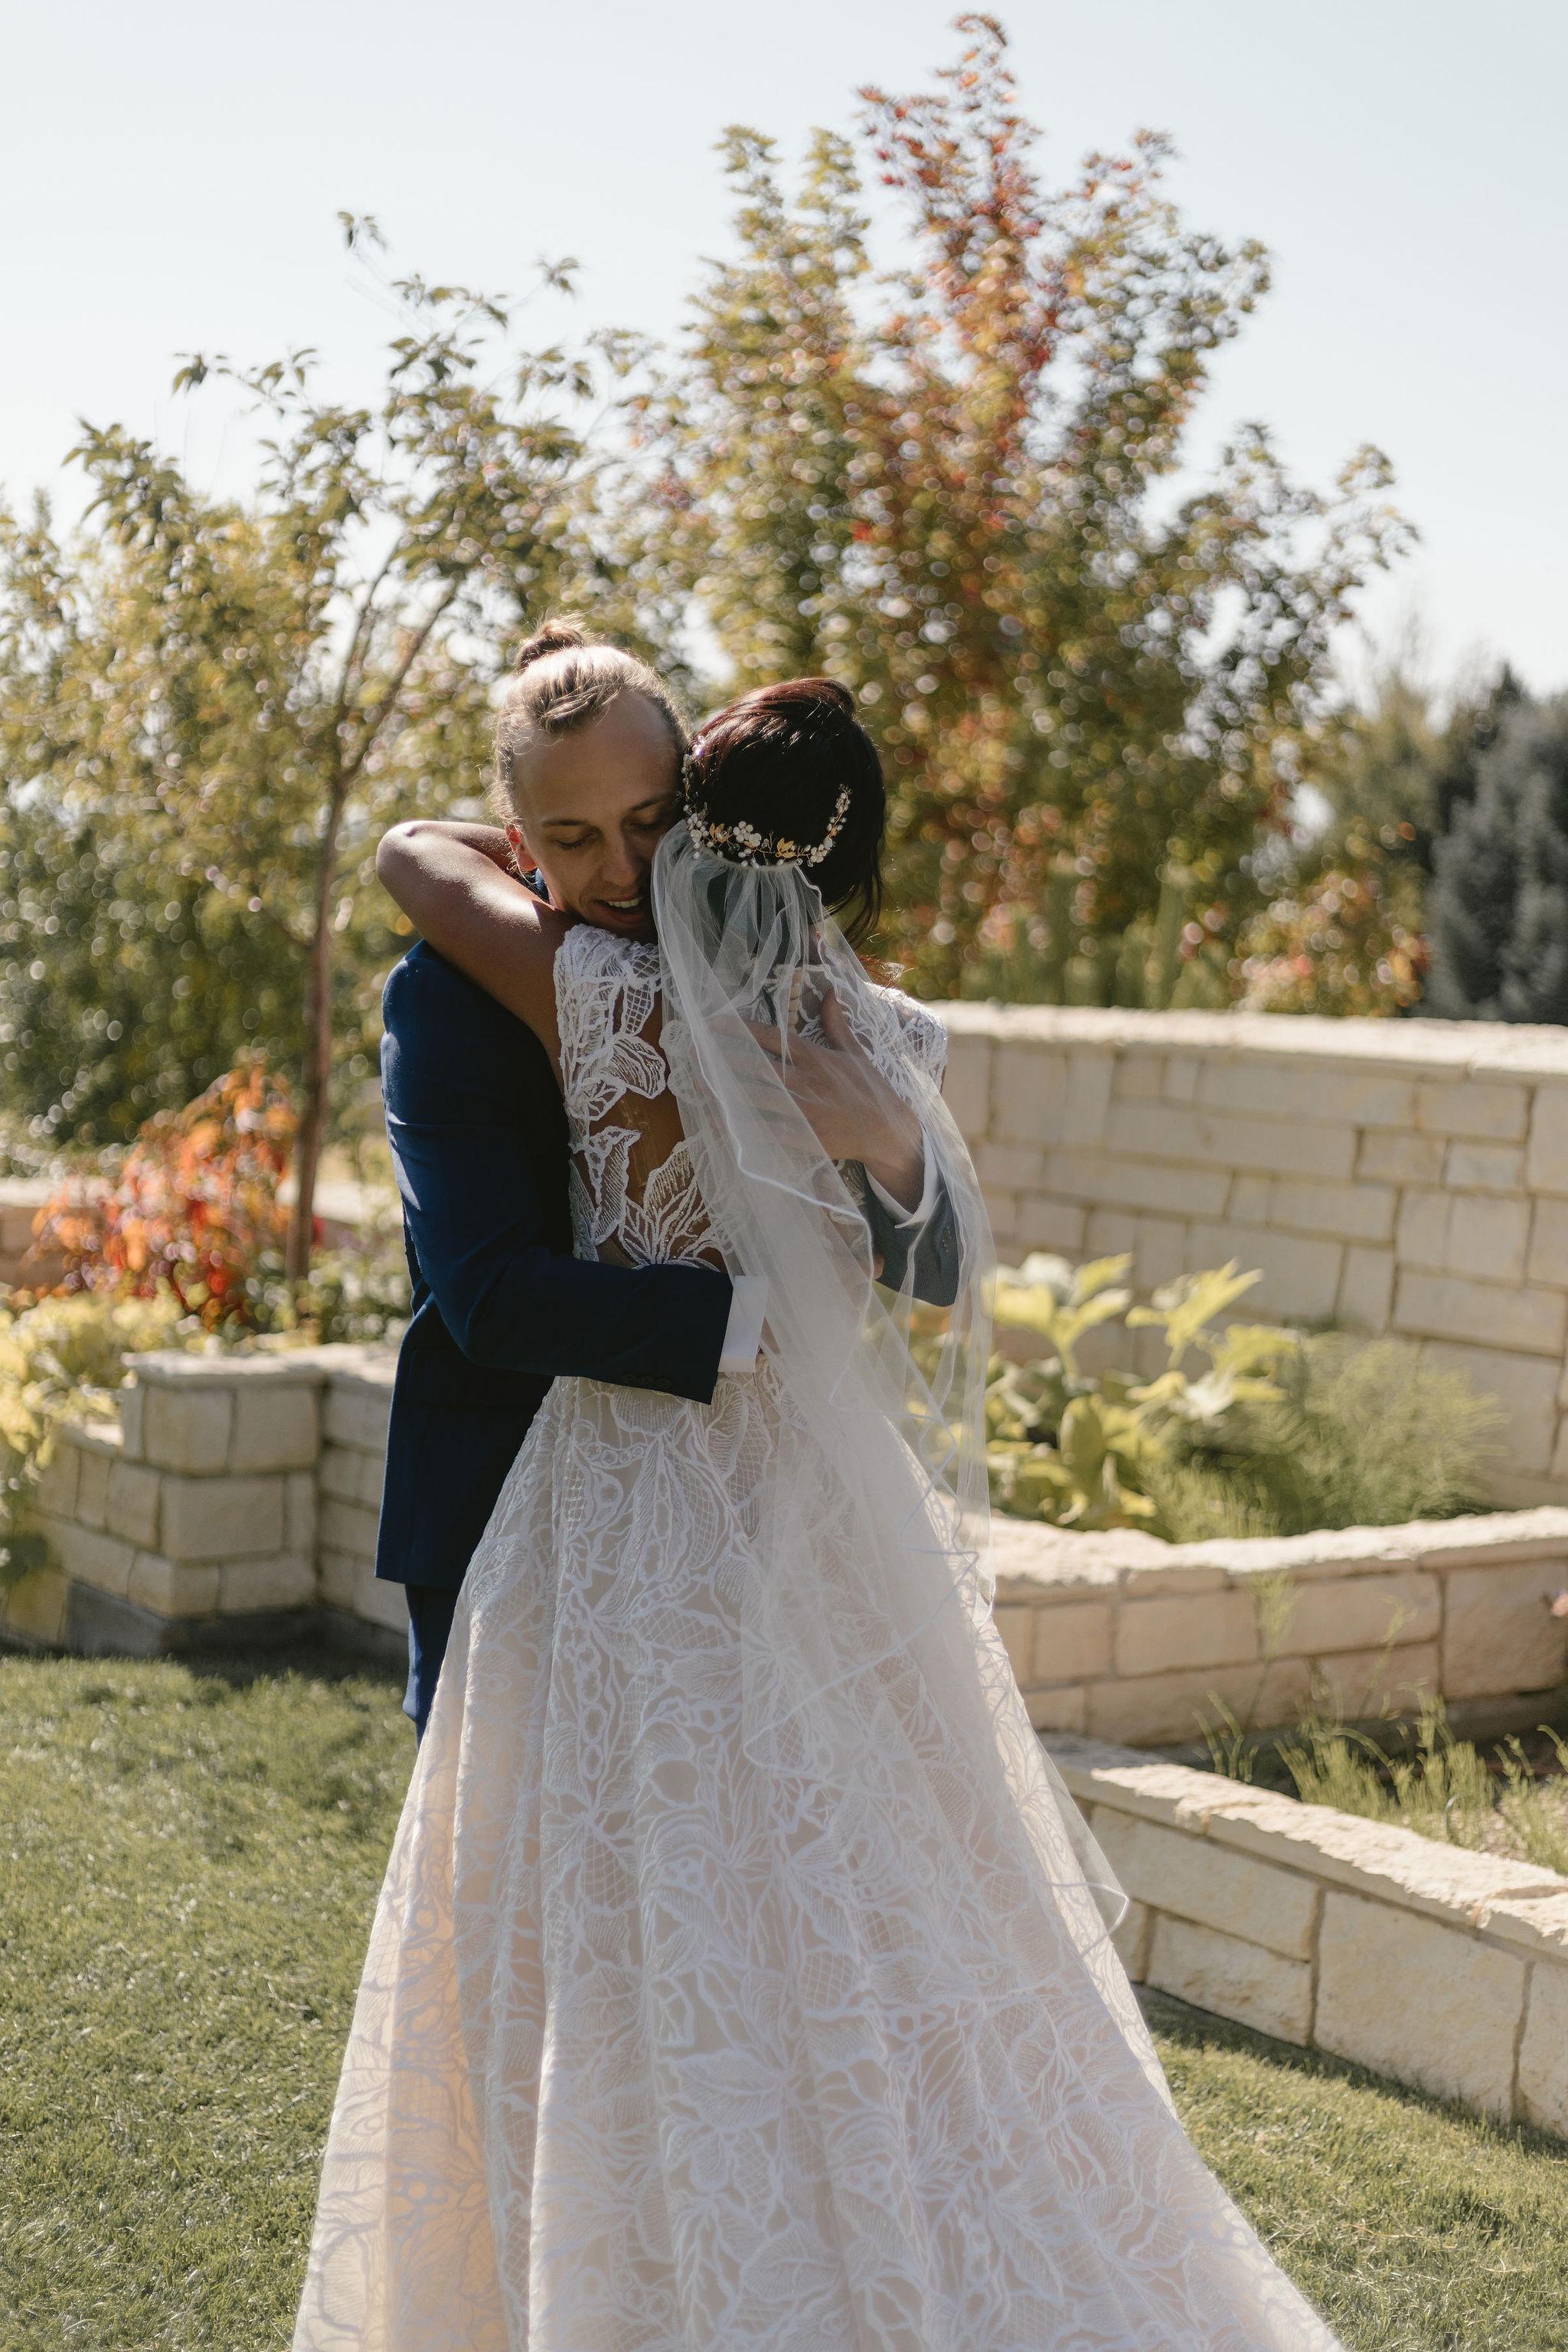 Modest Lace Wedding Dress Ballgown Backyard Summer Wedding Princess Kaiulani Tabernero 1